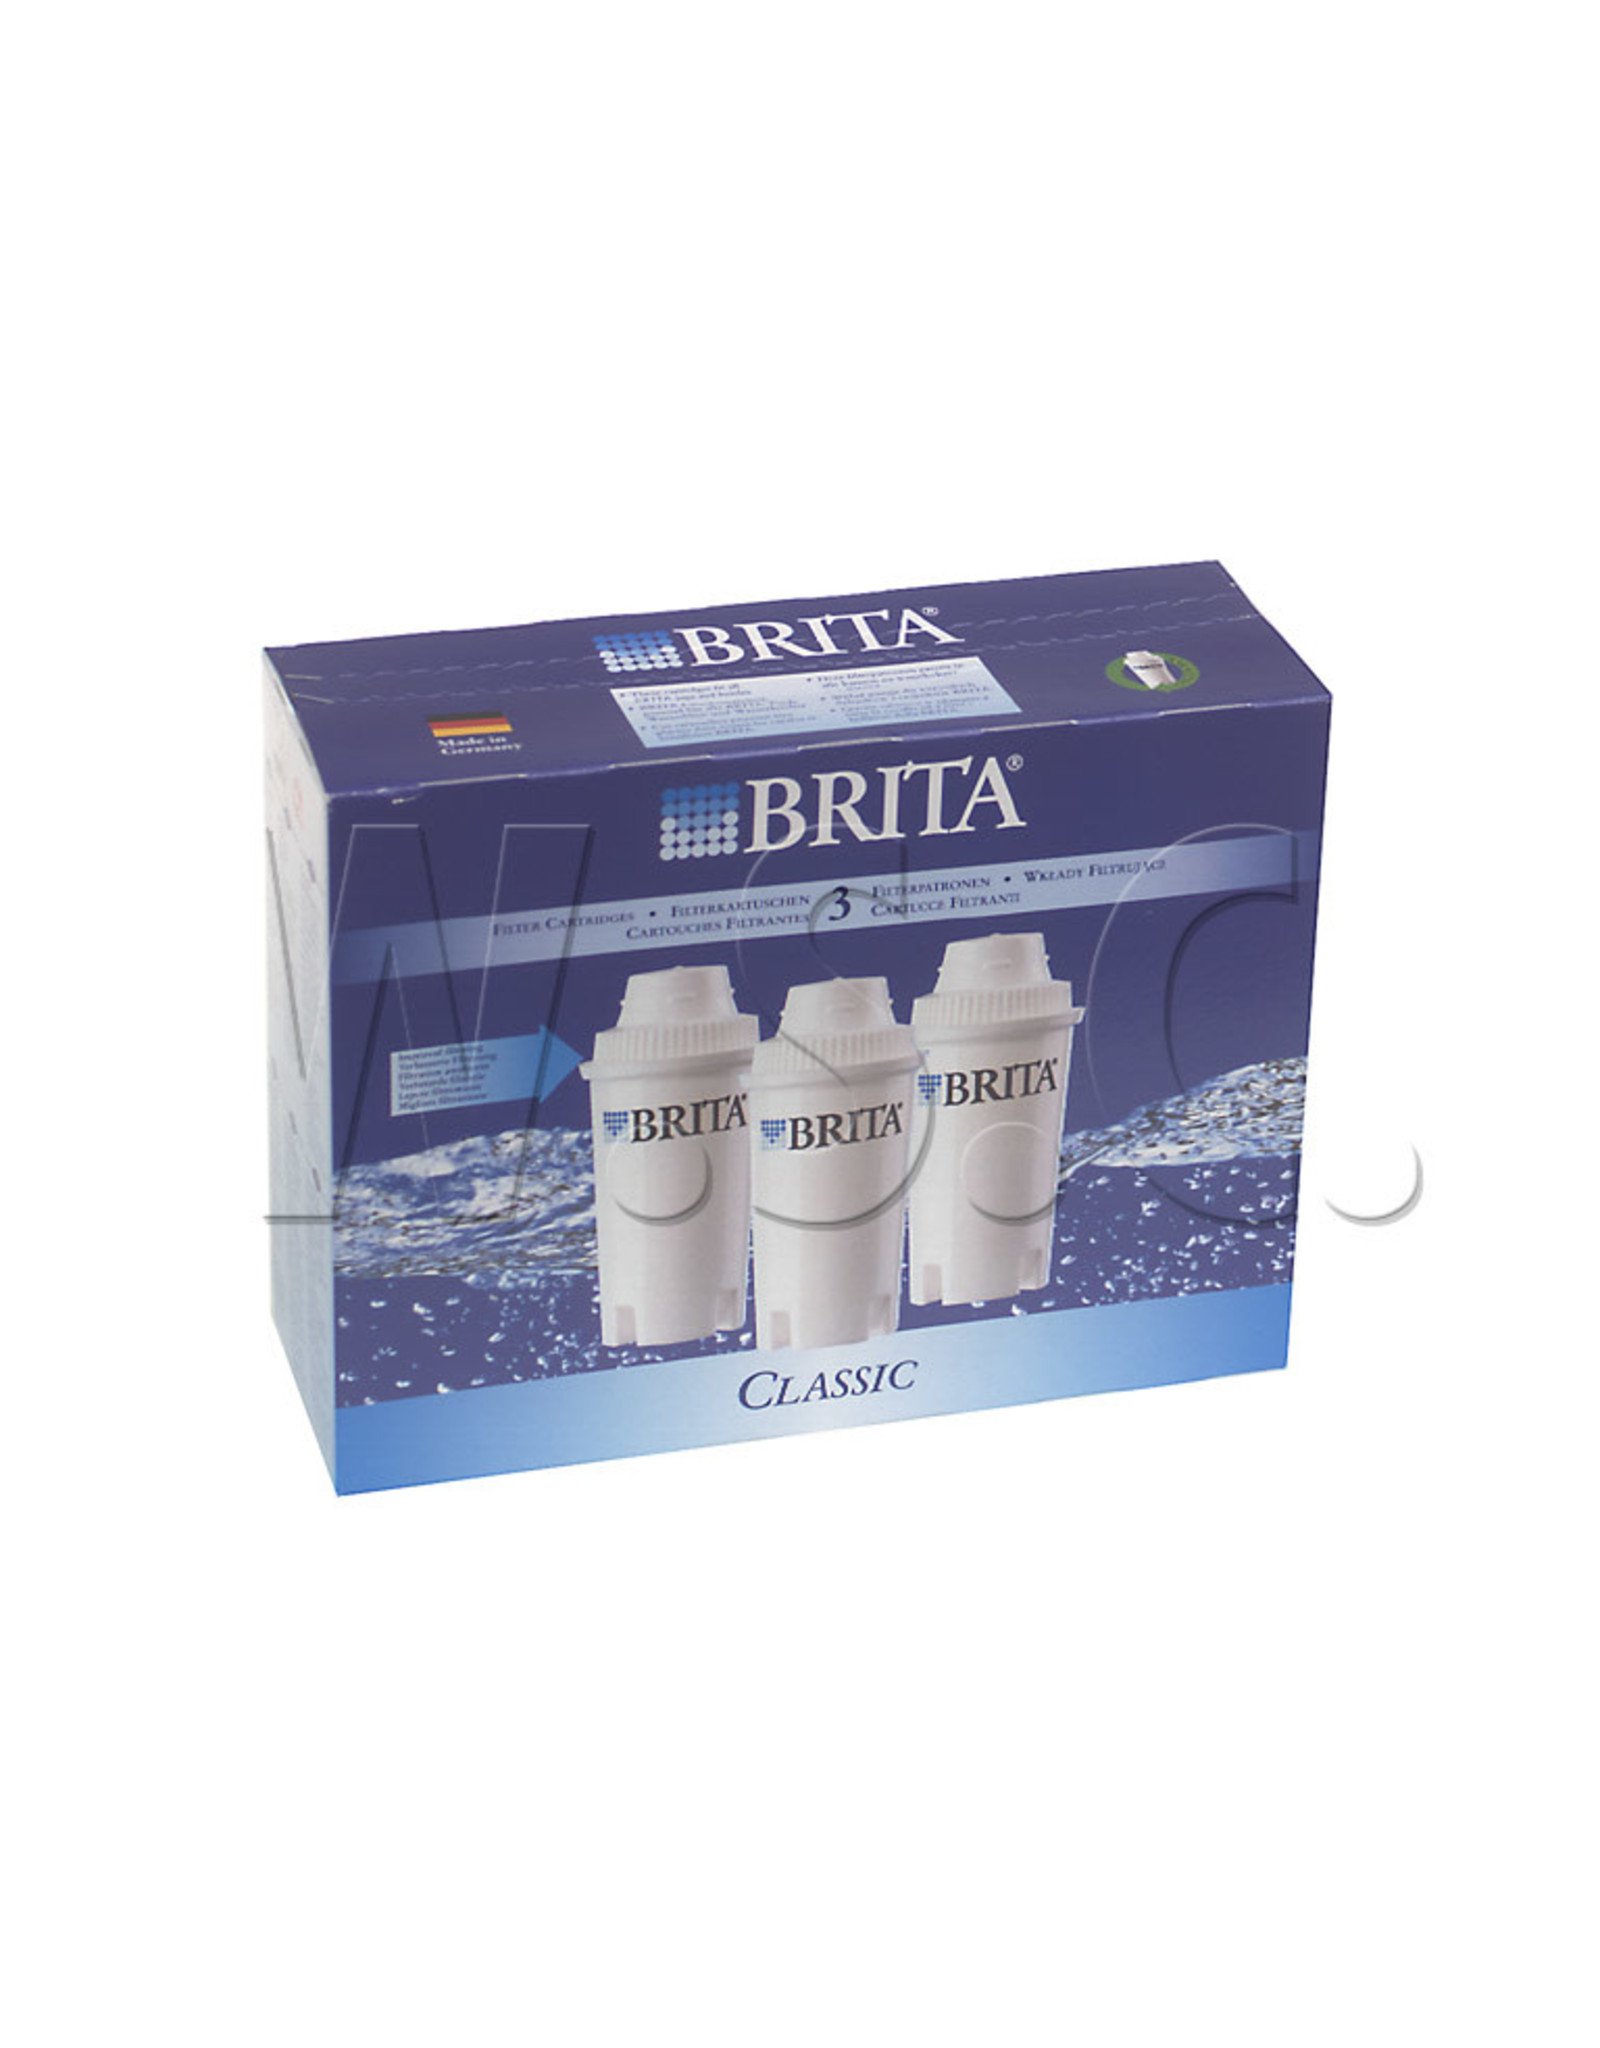 Brita BRITA      NAVULPATROON 3-PACK